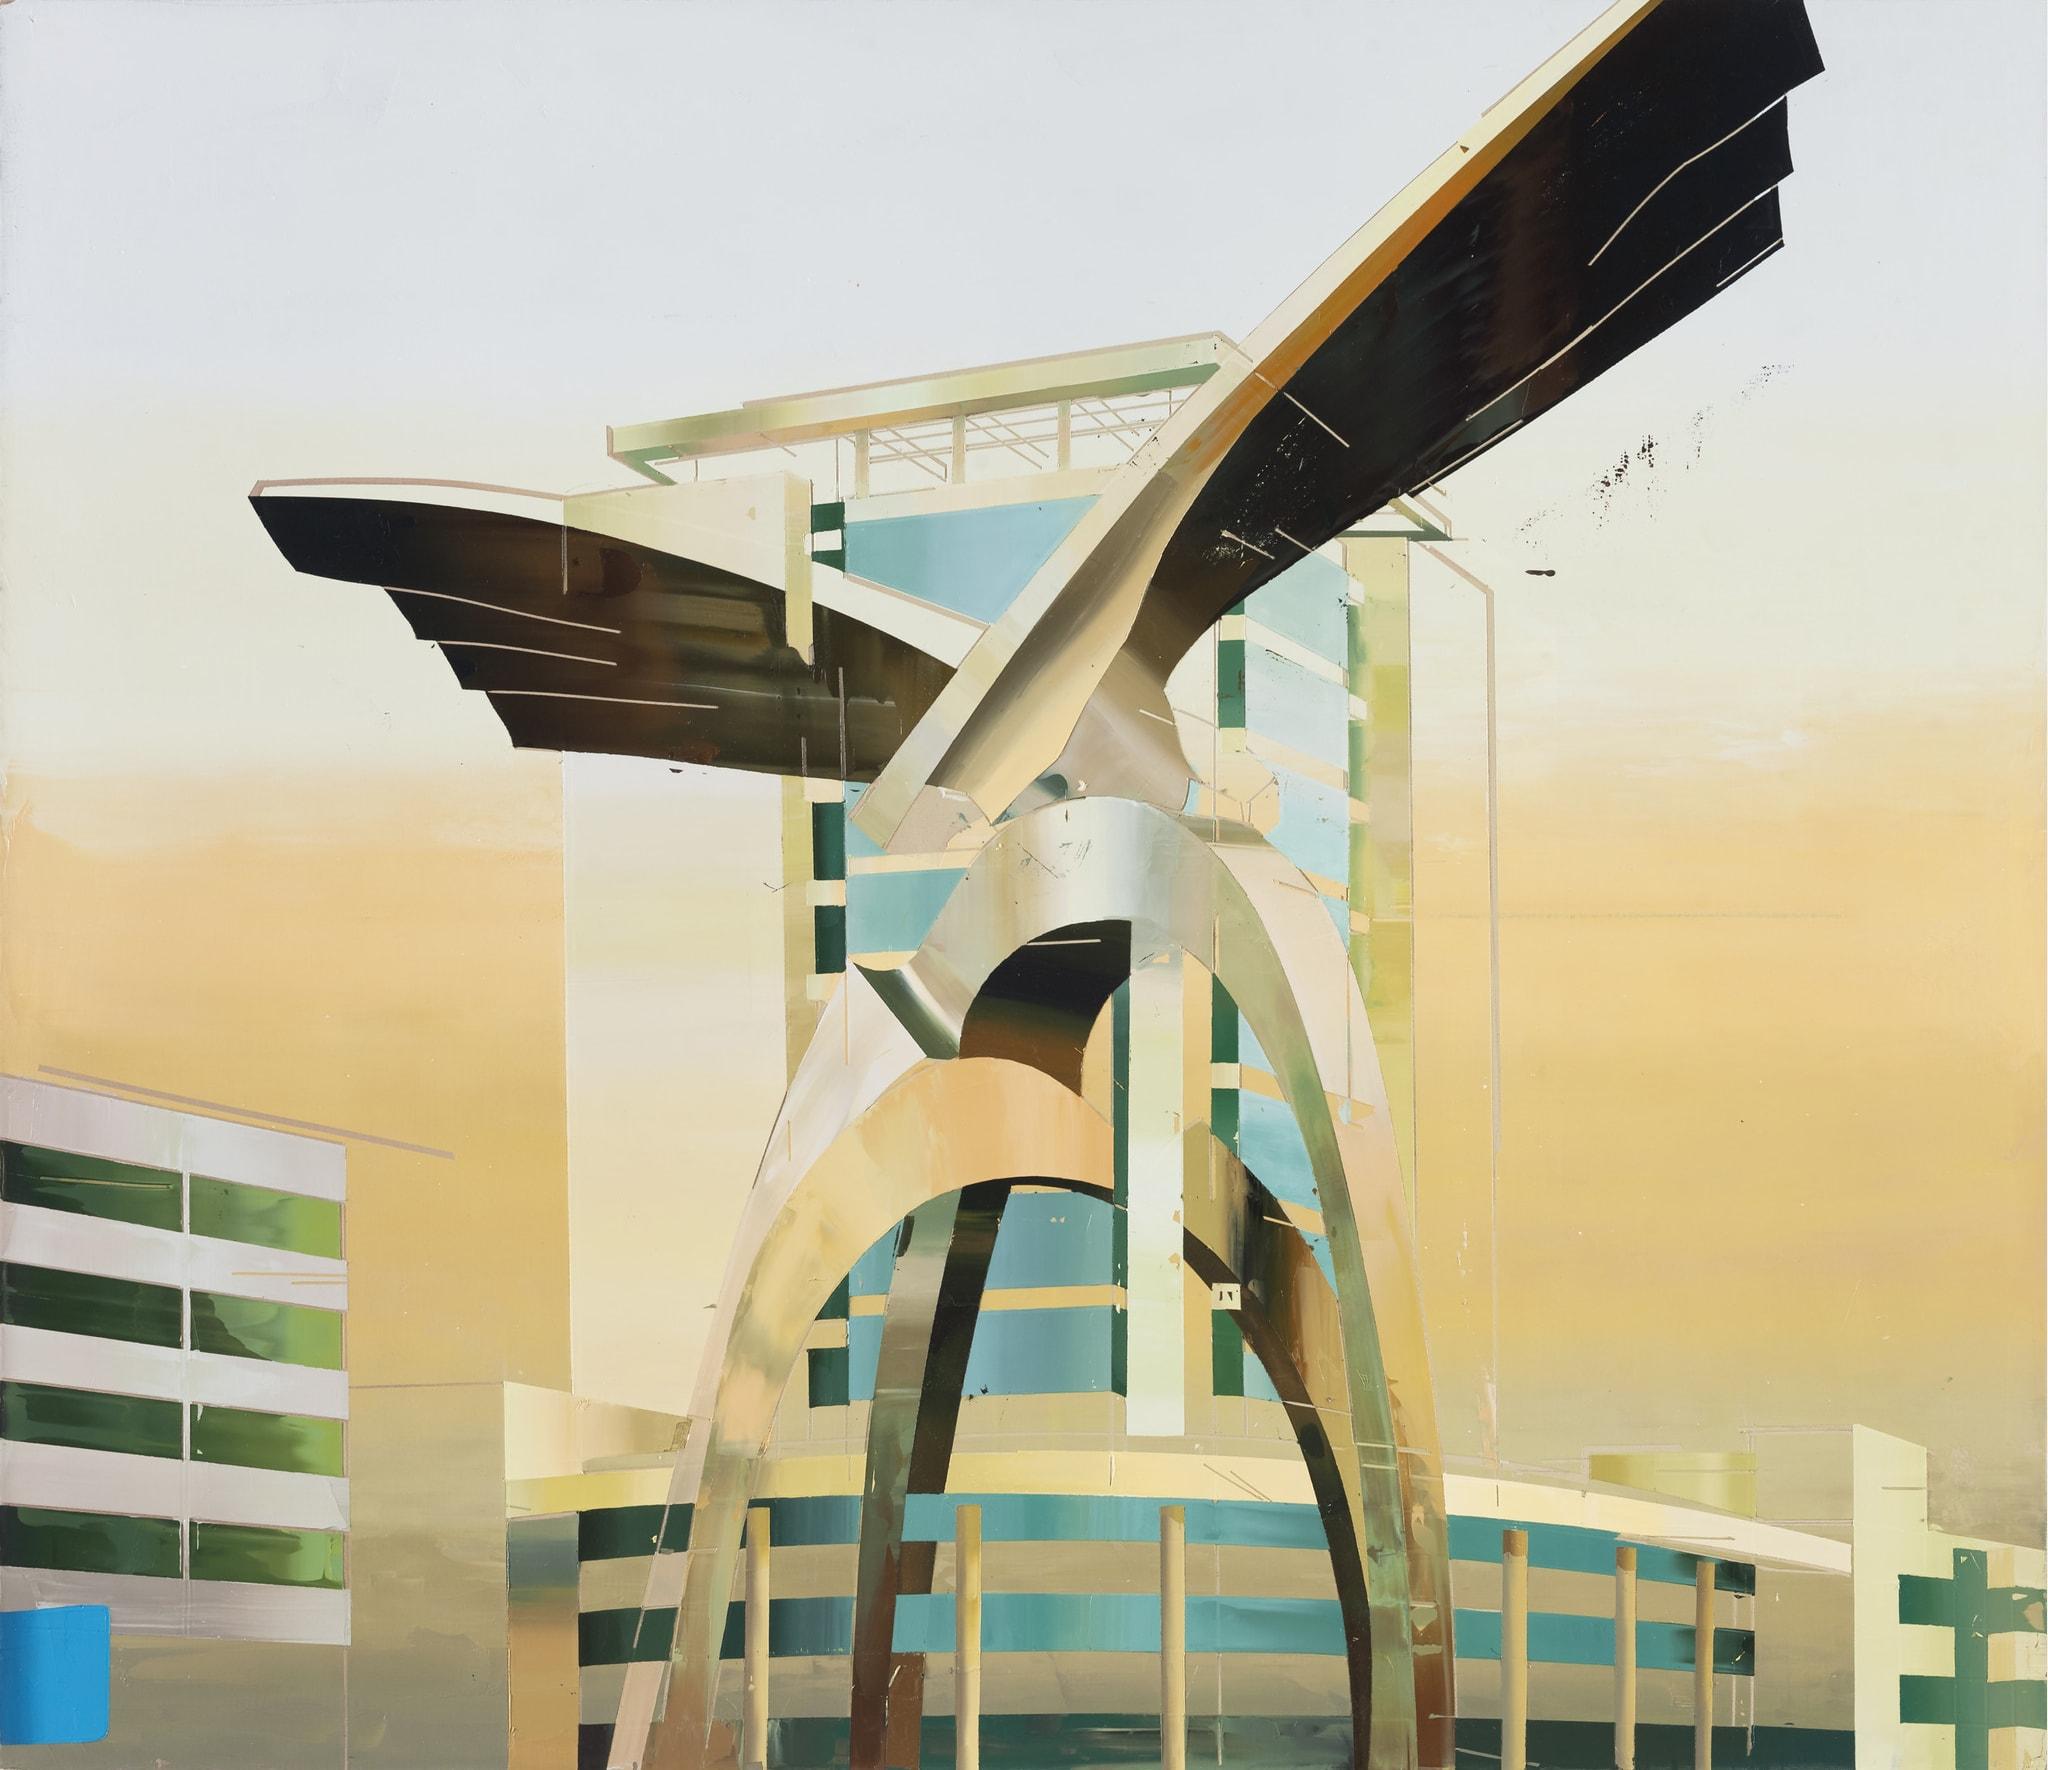 Building of Eagles by Cui Jie